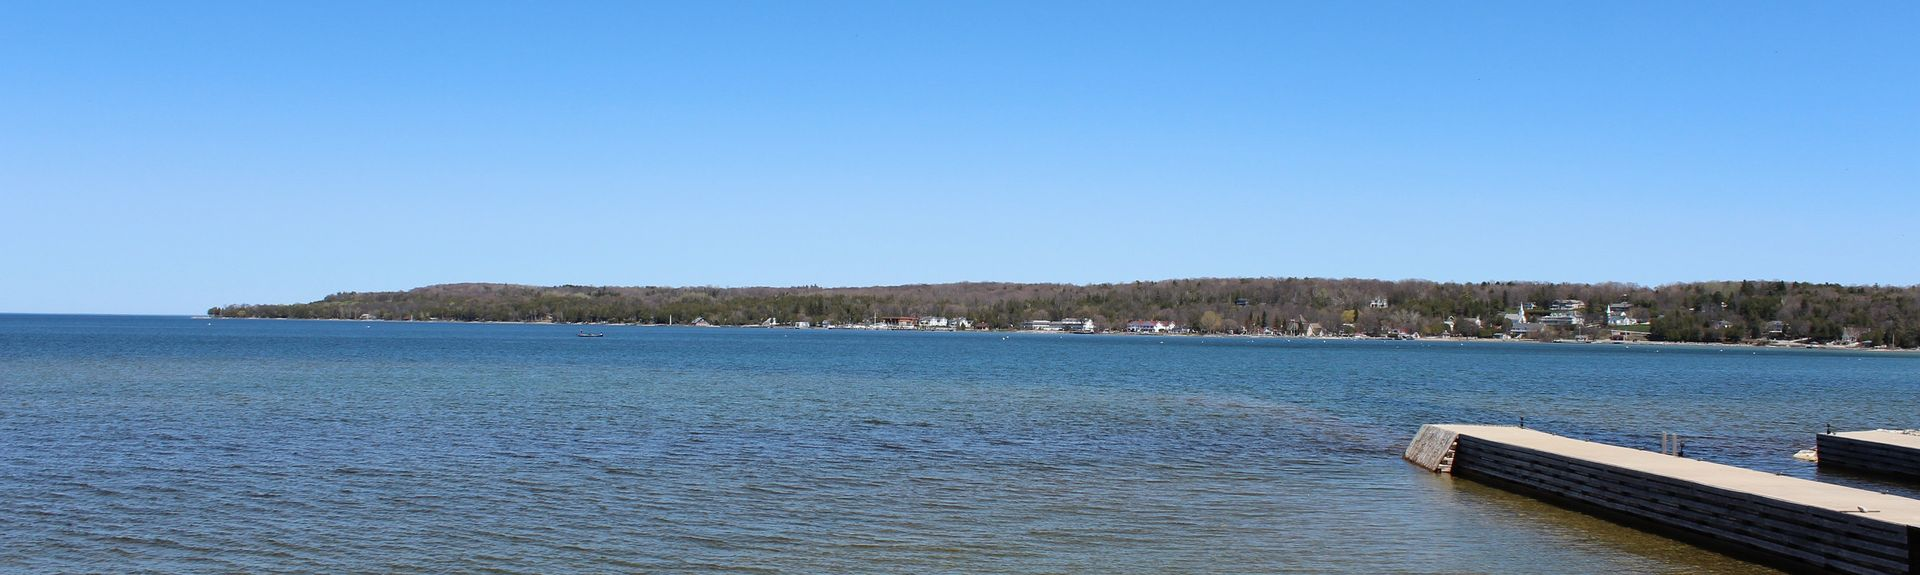 Baileys Harbor Ridges Park, Baileys Harbor, Wisconsin, United States of America